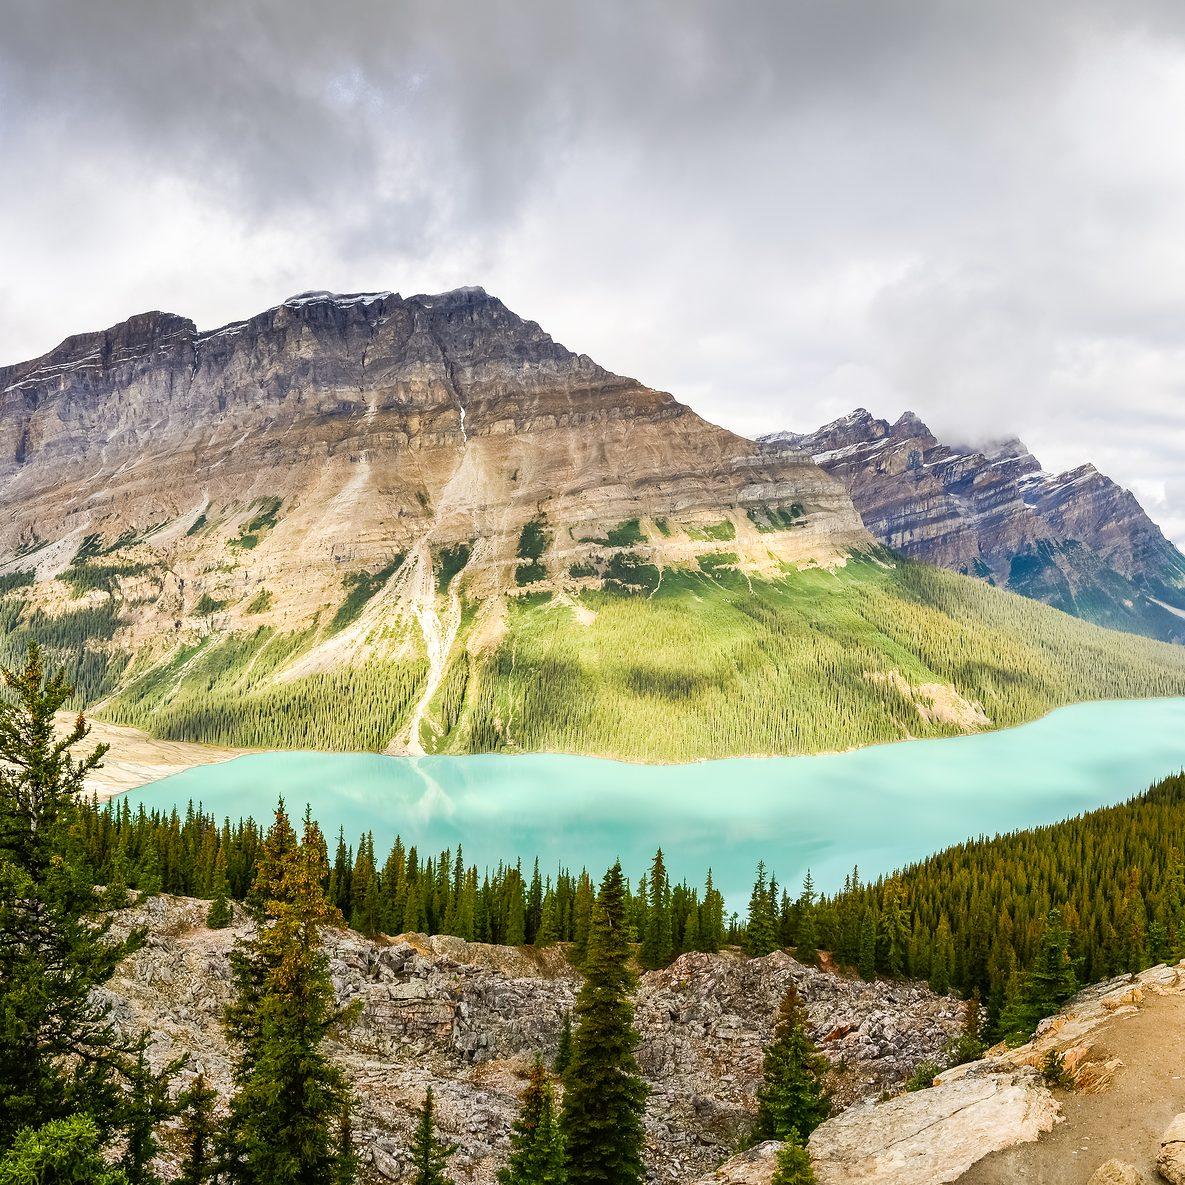 Panoramic view of Peyto lake and Rocky mountains Alberta Canada